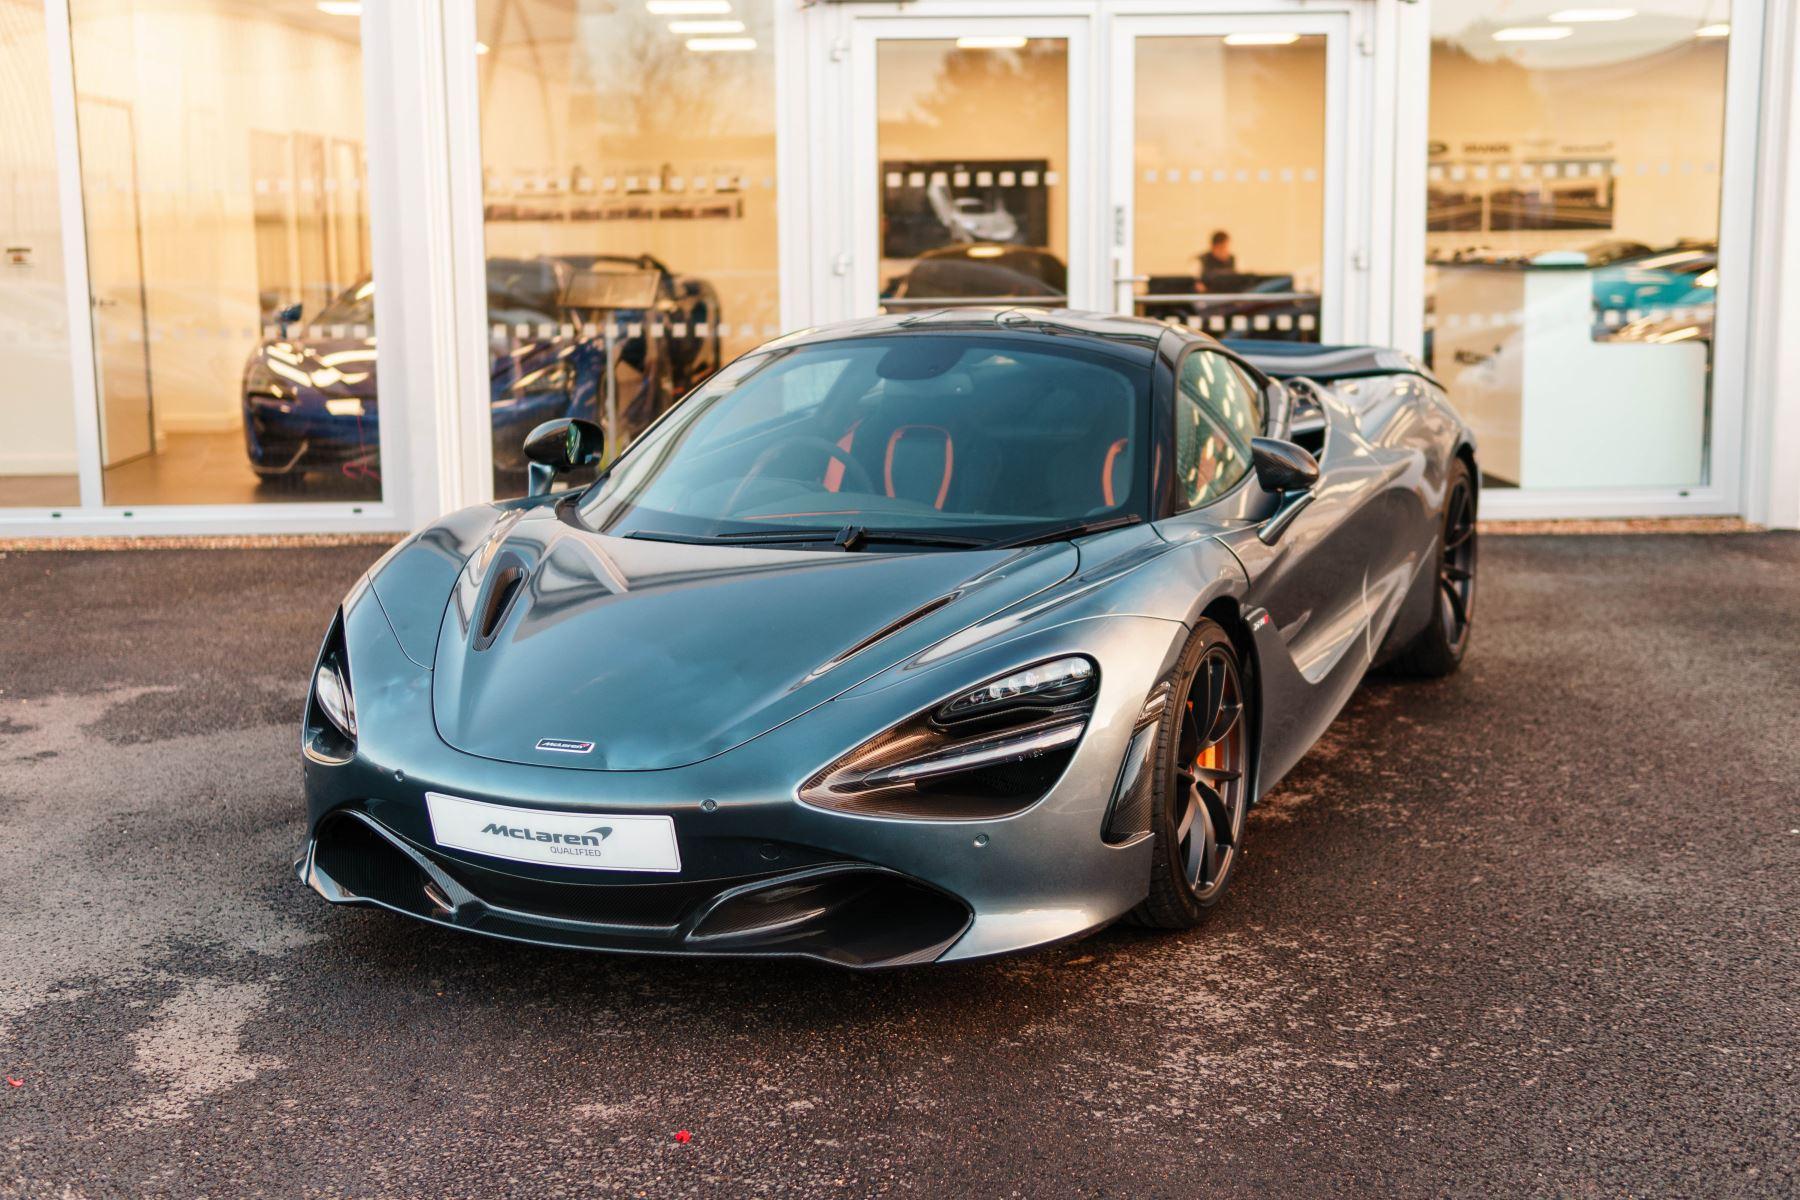 McLaren 720S Performance Coupe  image 2